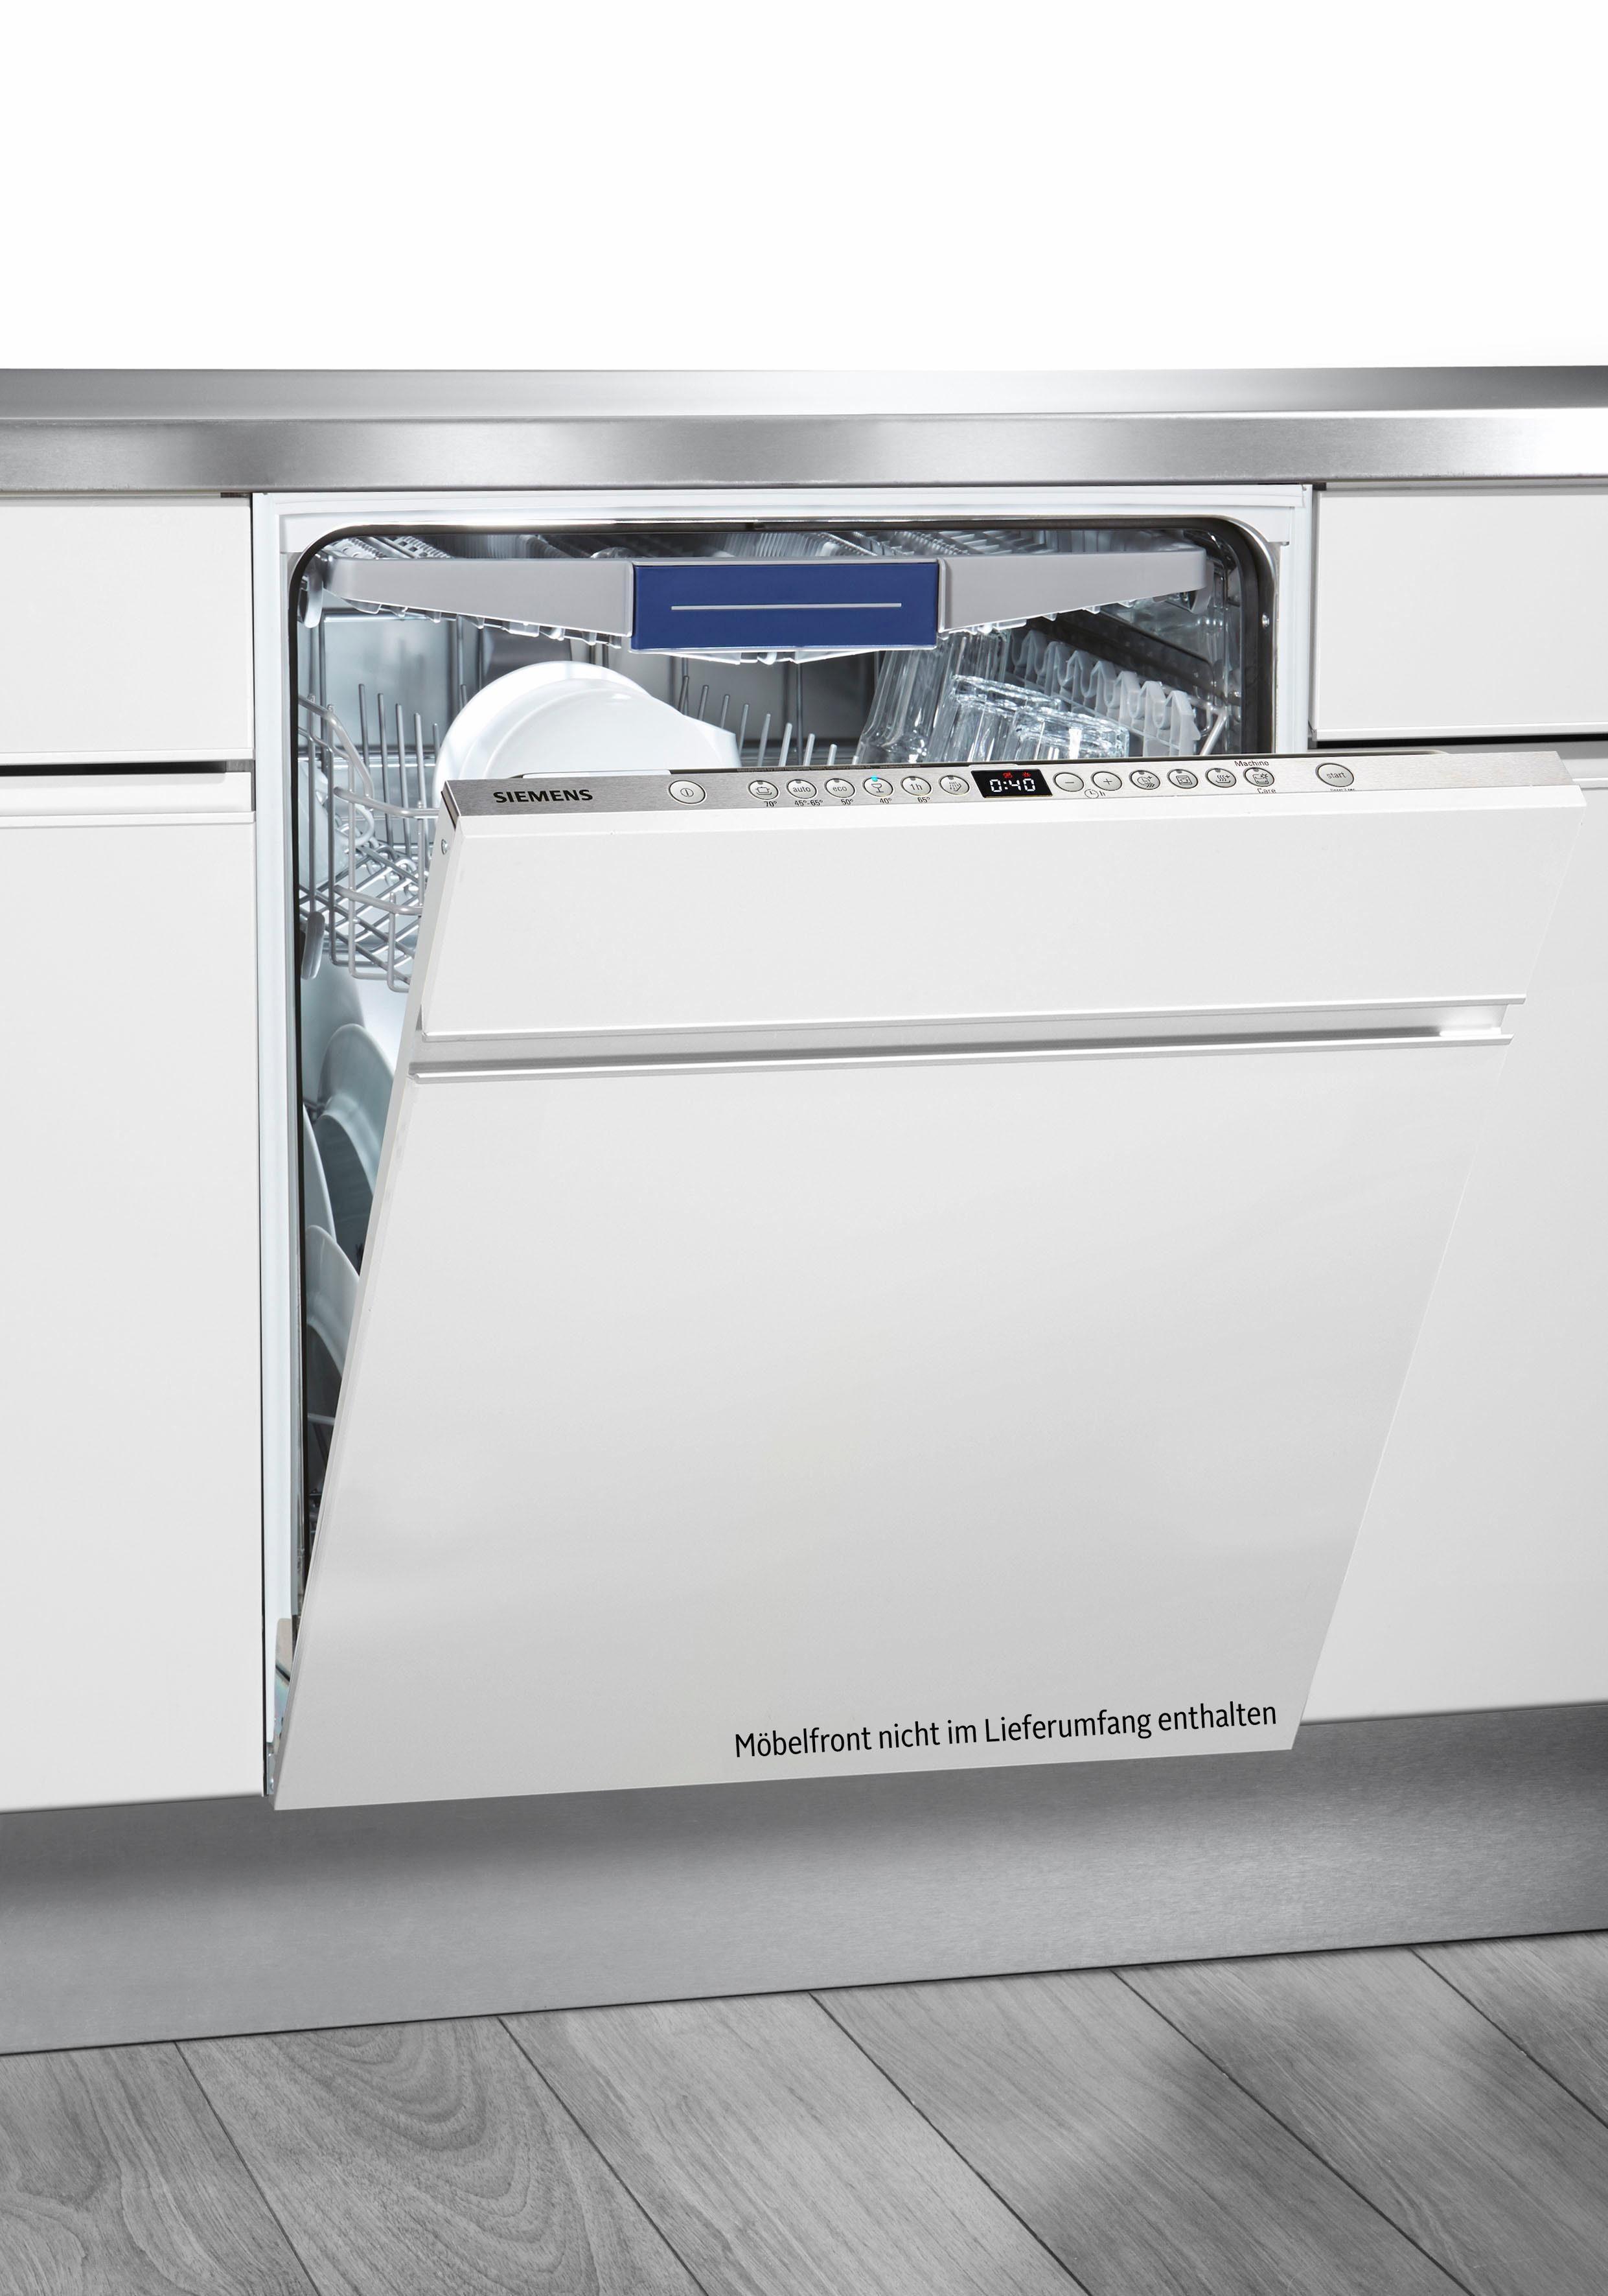 SIEMENS Vollintegrierbarer Einbaugeschirrspüler iQ300 SX636X03ME, A++, 9,5 Liter, 14 Maßgedecke